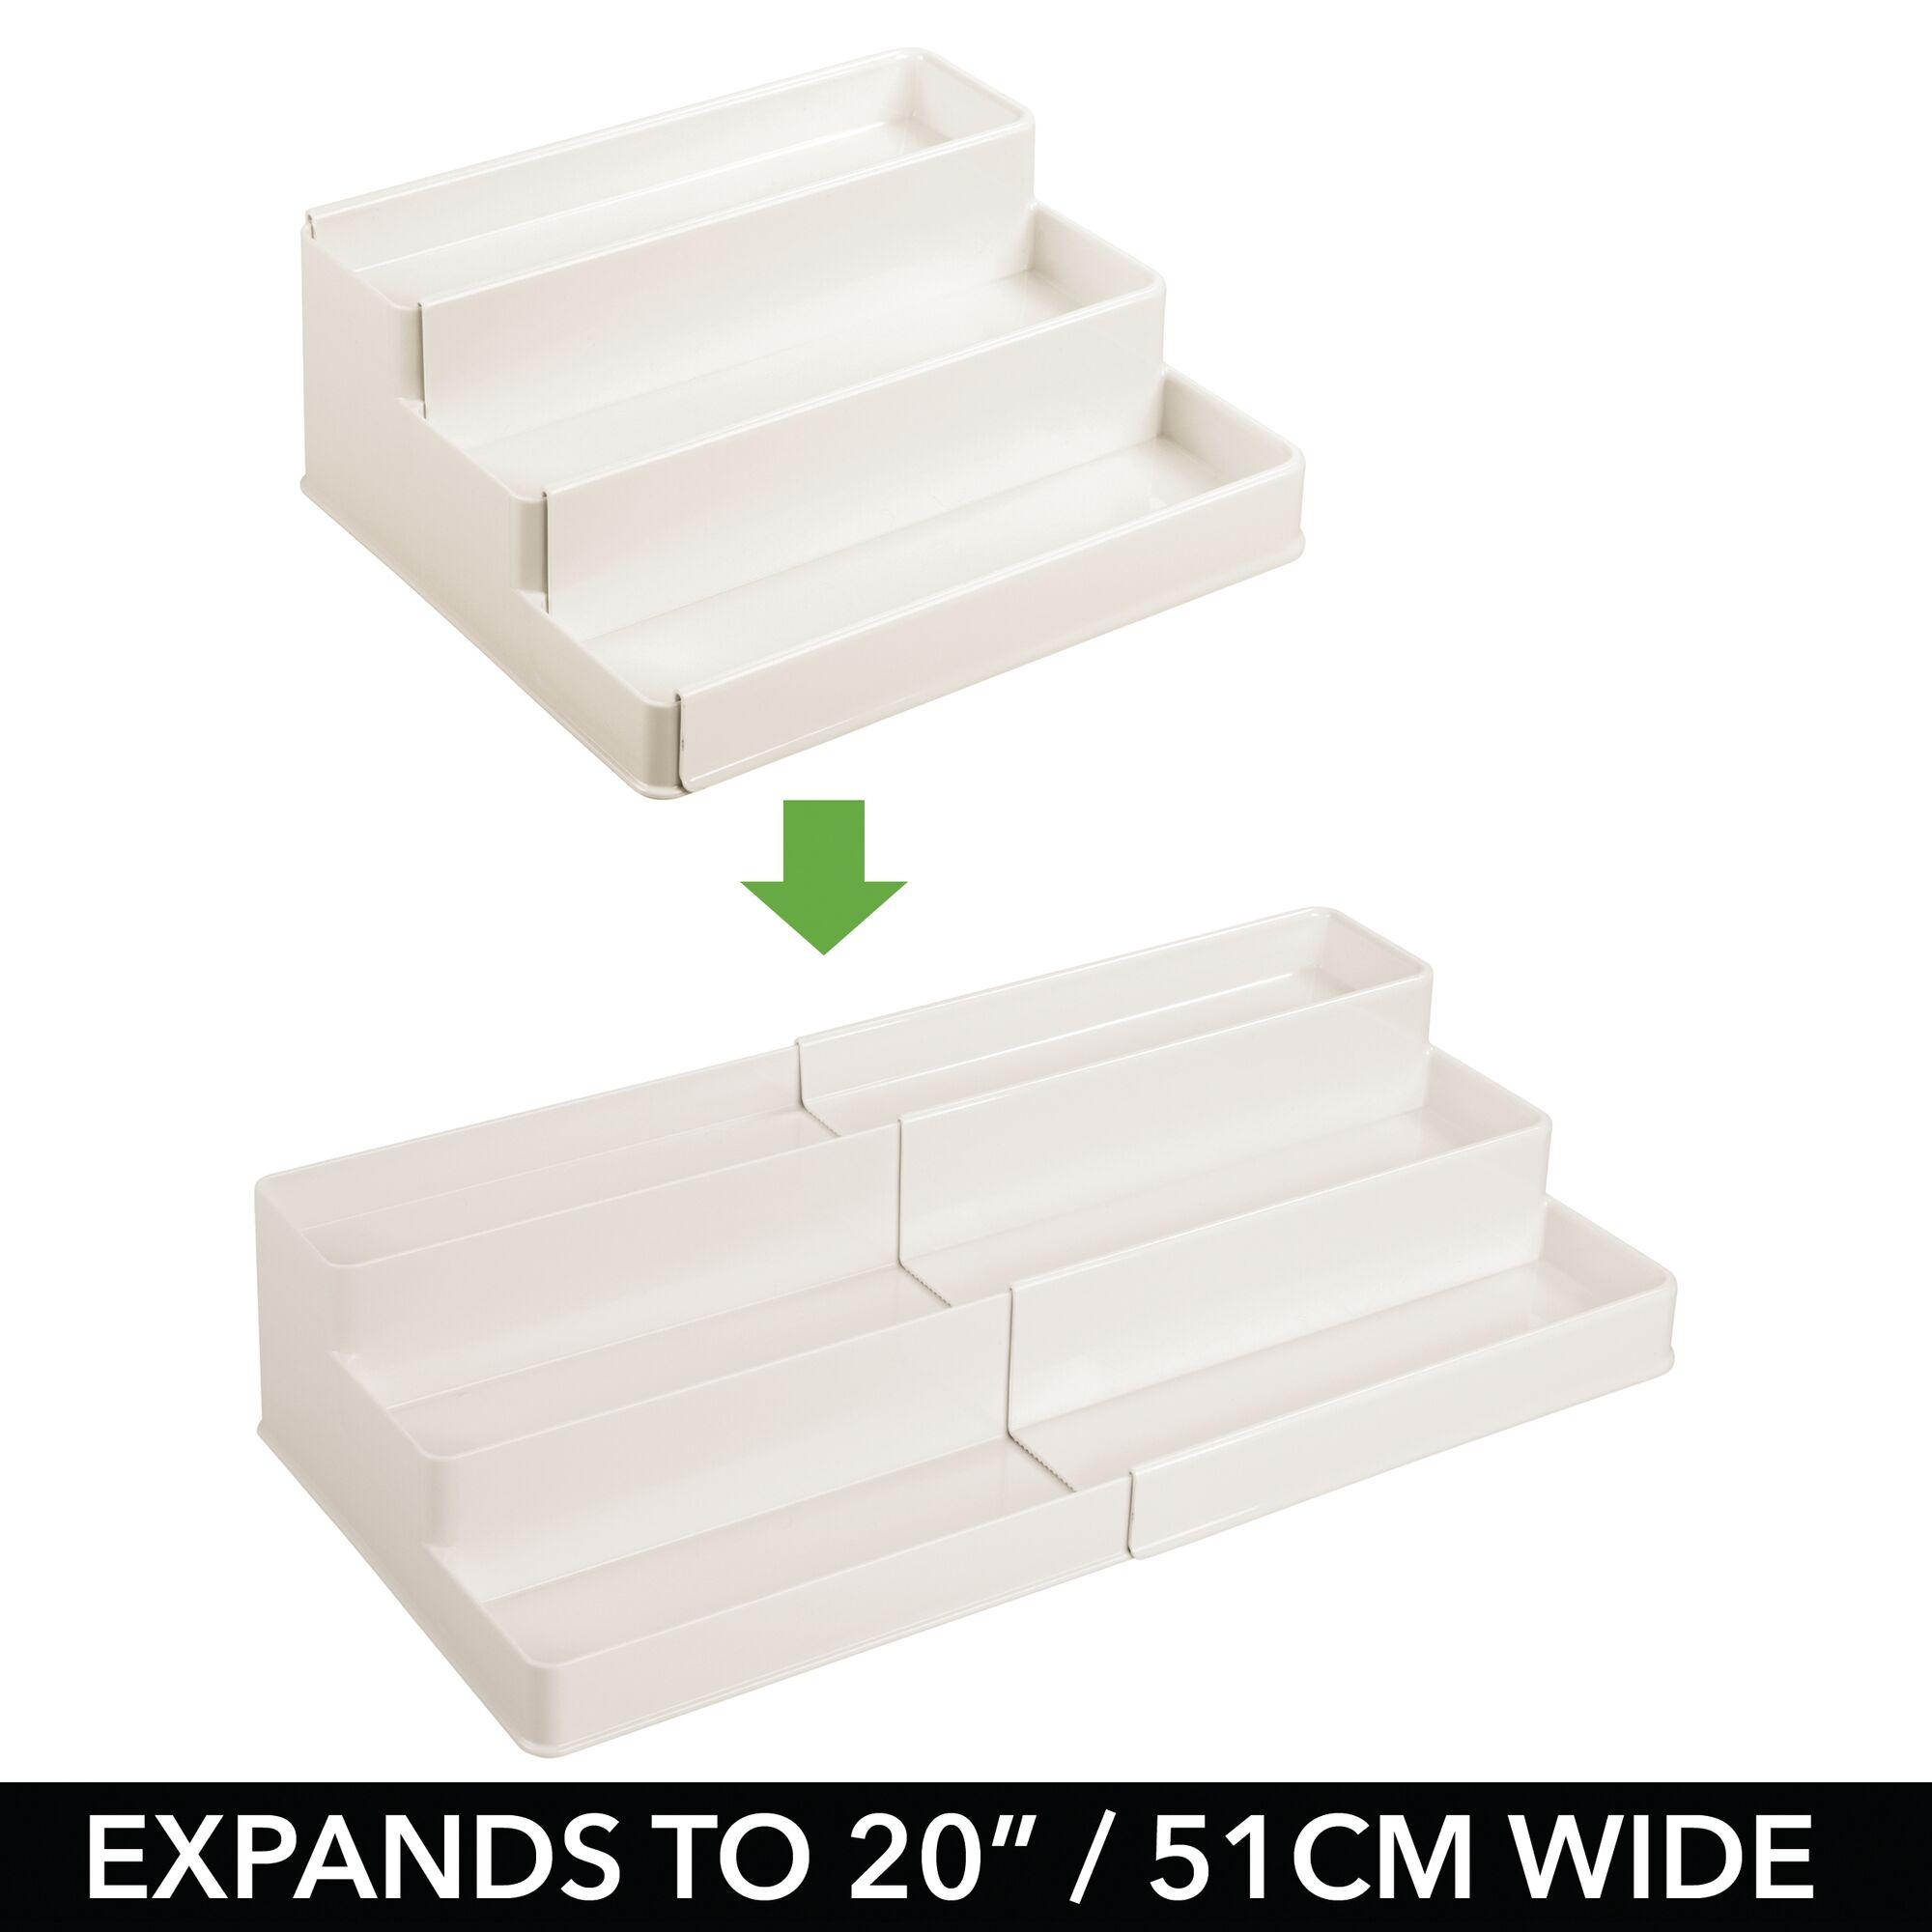 mDesign-Expandable-Kitchen-Cabinet-Pantry-Organizer-Spice-Rack thumbnail 38